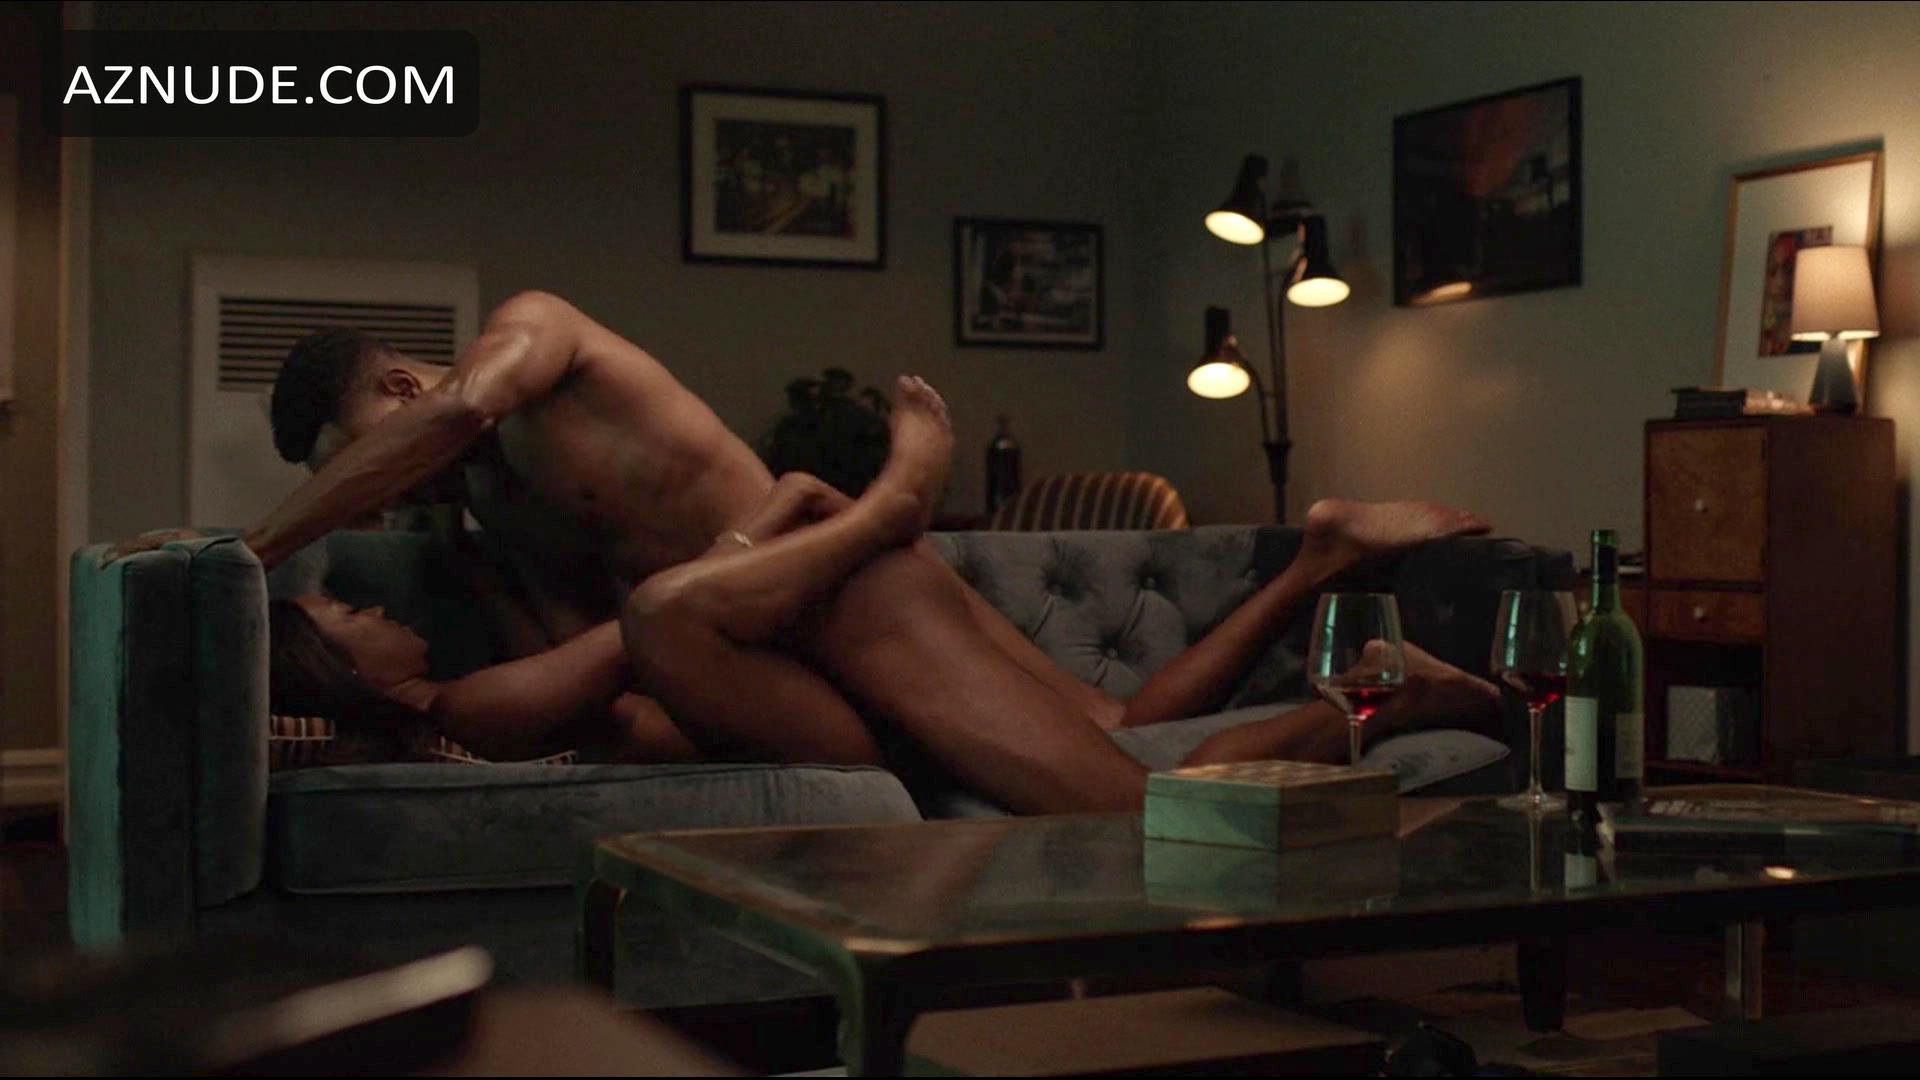 Marisa miller nude picture